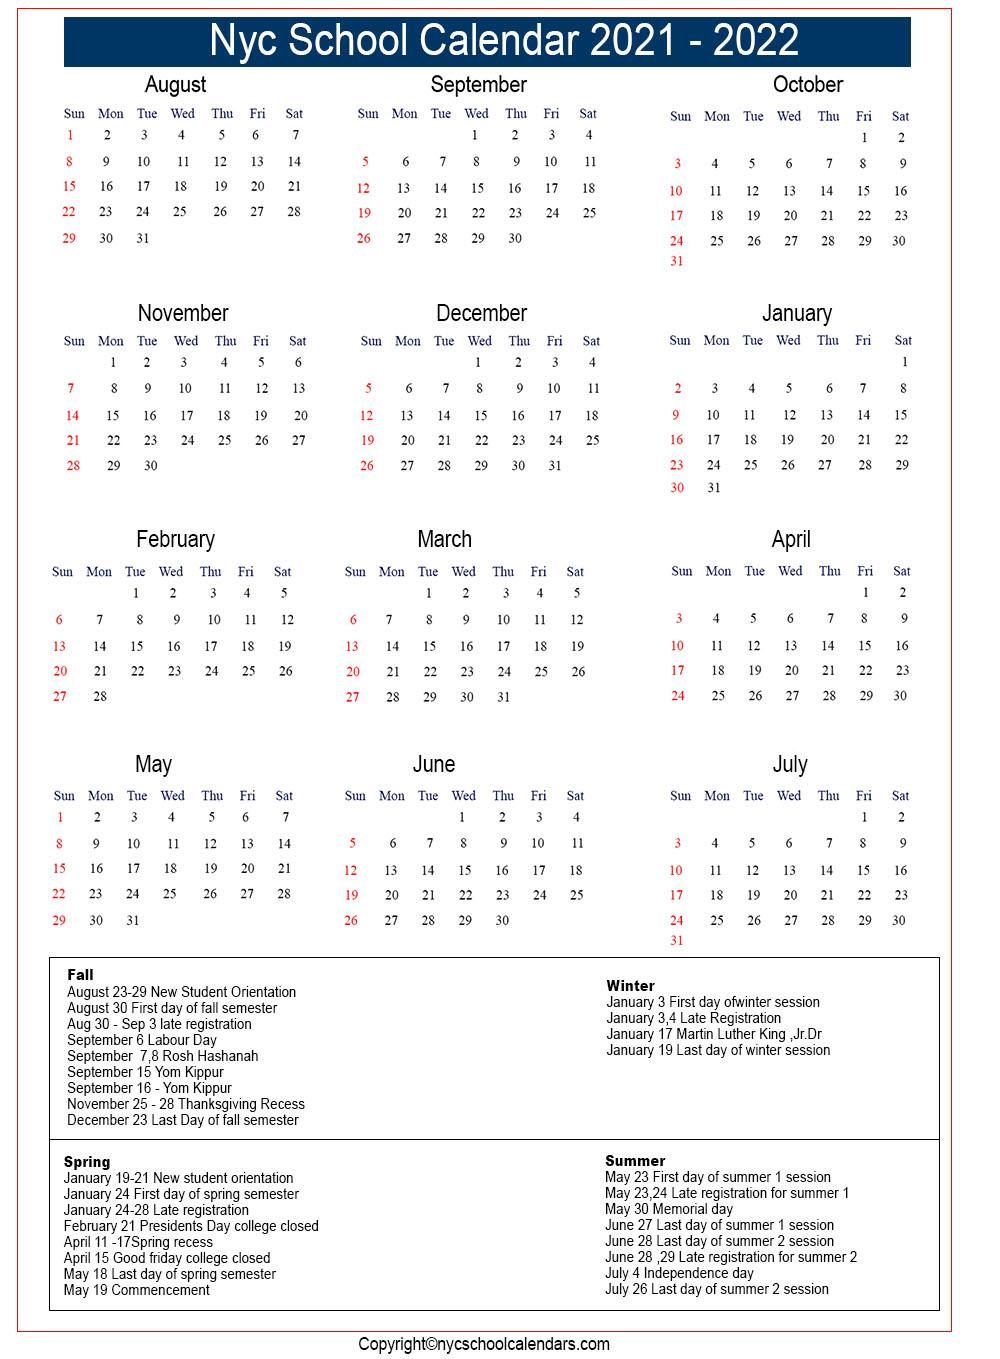 Nyc School Calendar 2021 ✅❤️ Pertaining To Rye Country Day School Calendar 2021